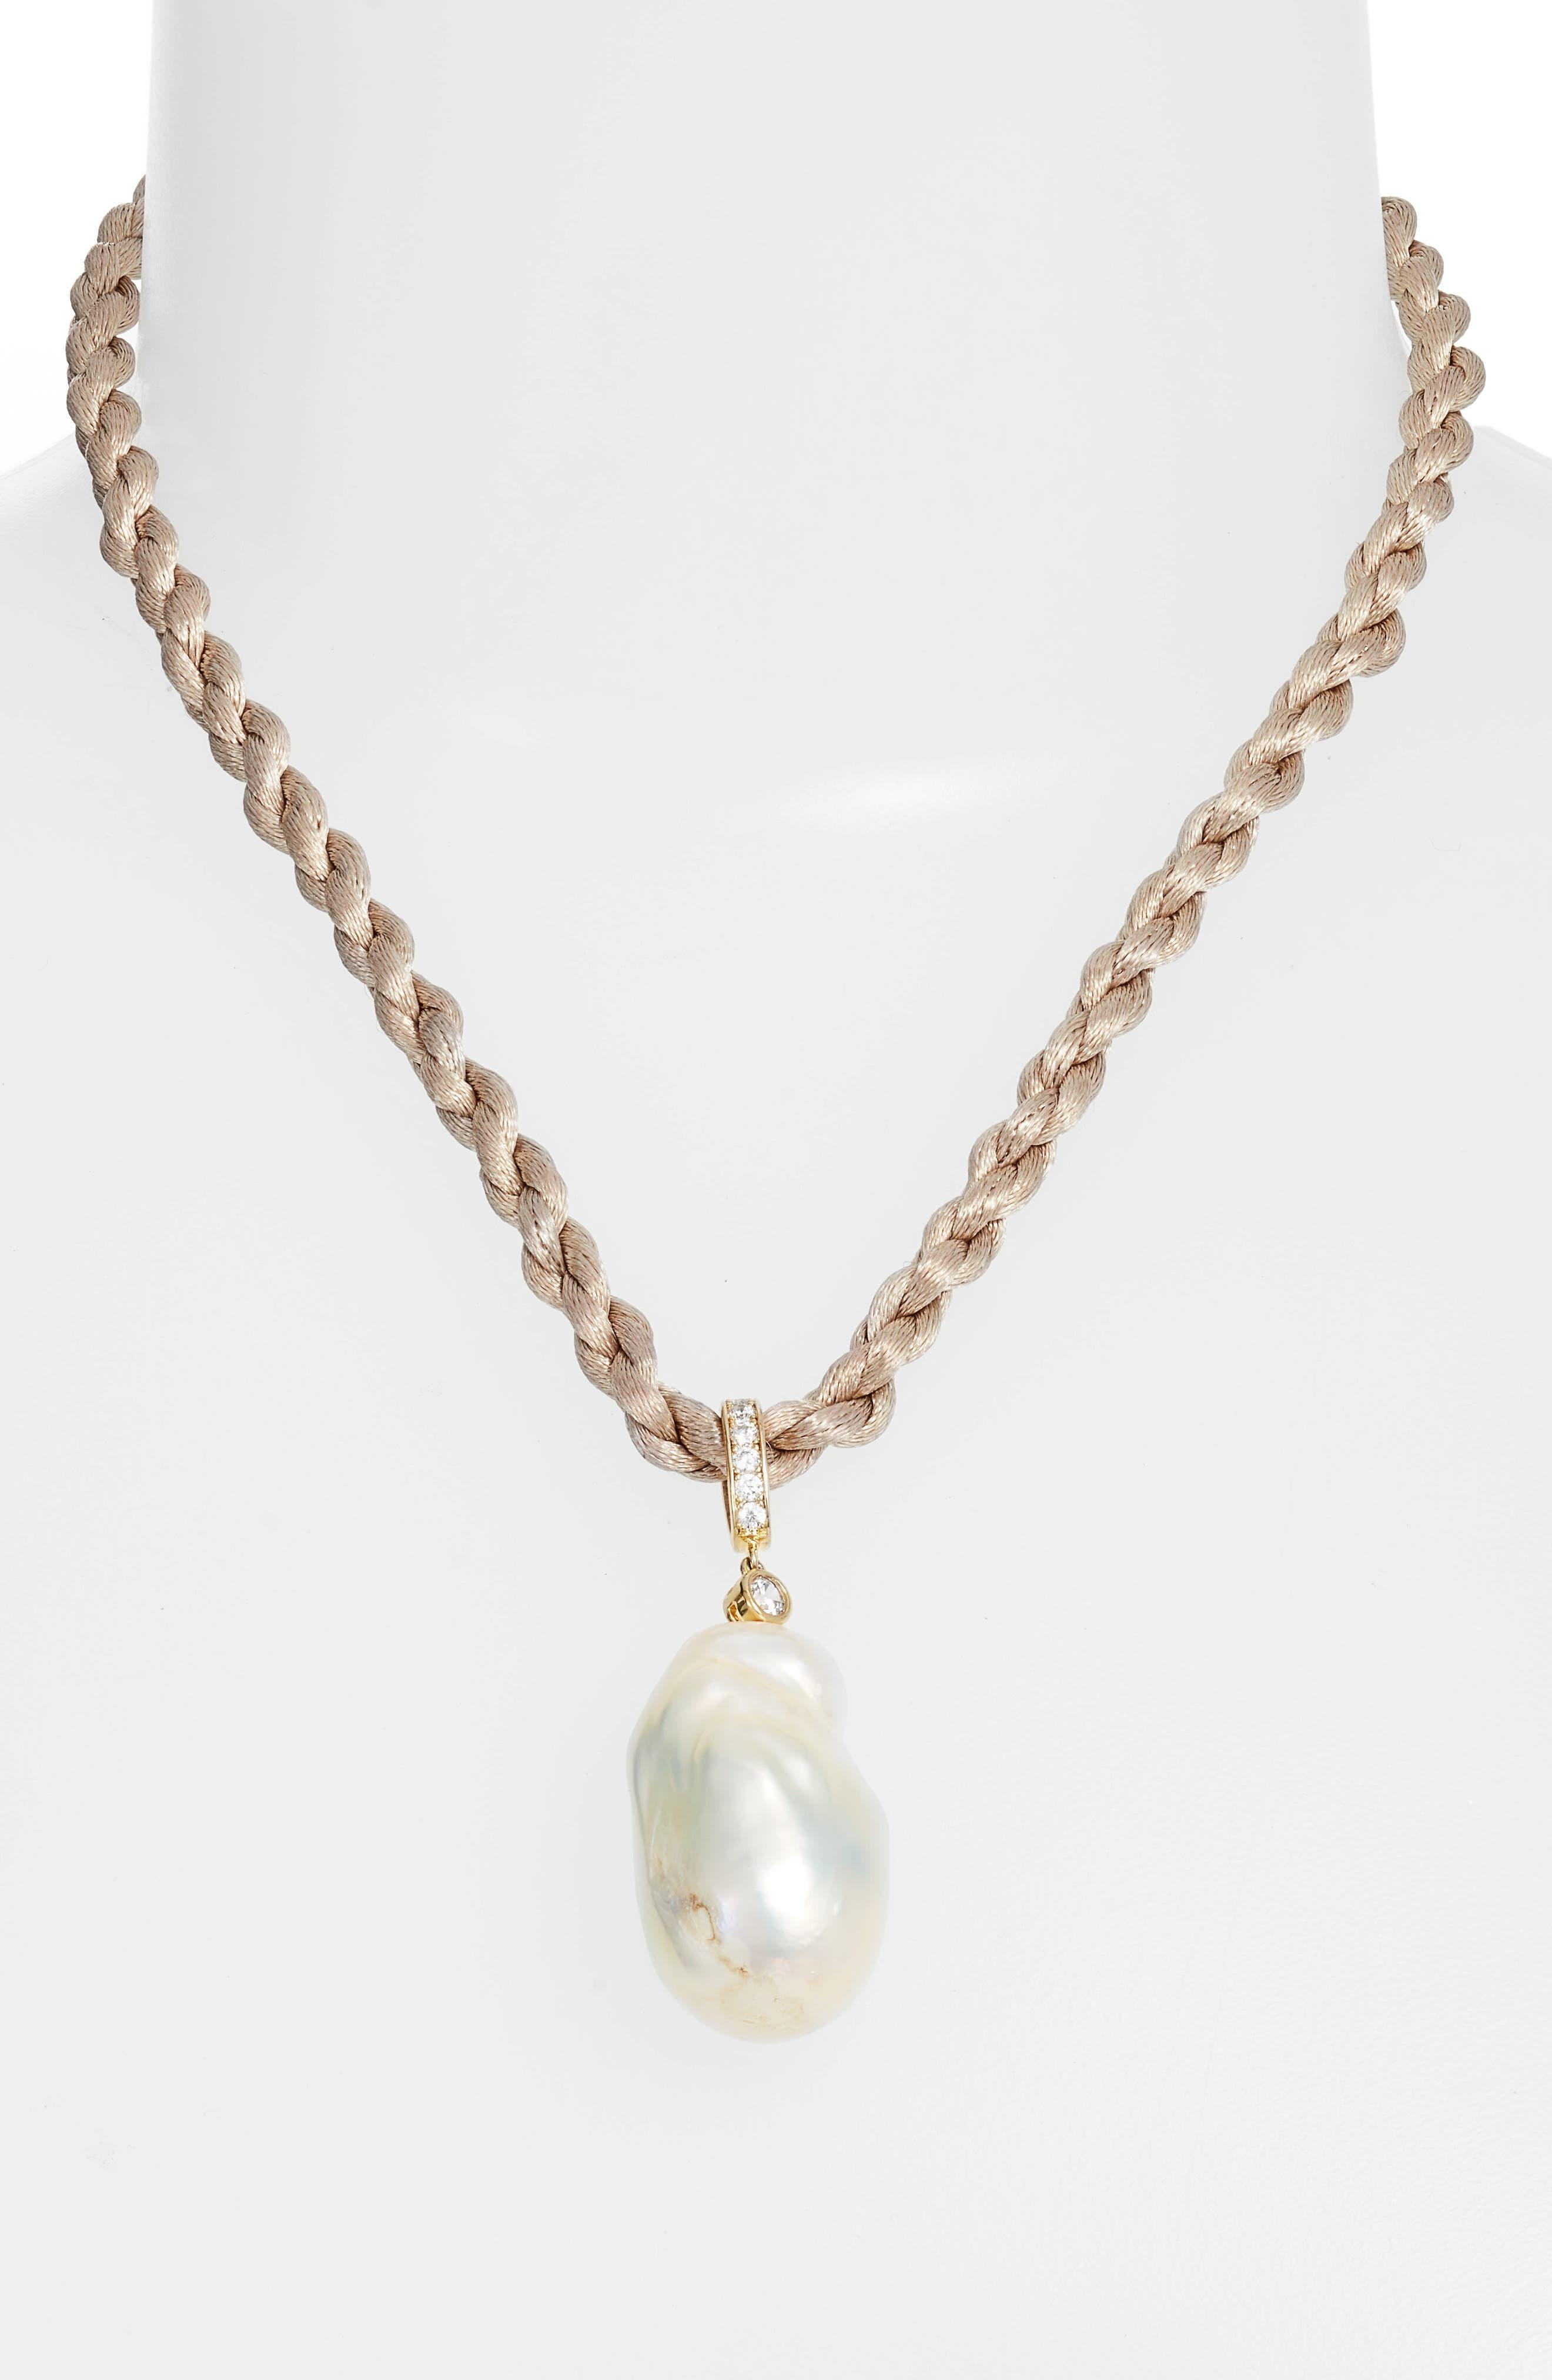 NINA, Baroque Freshwater Pearl & Cubic Zirconia Pendant Necklace, Alternate thumbnail 2, color, 100